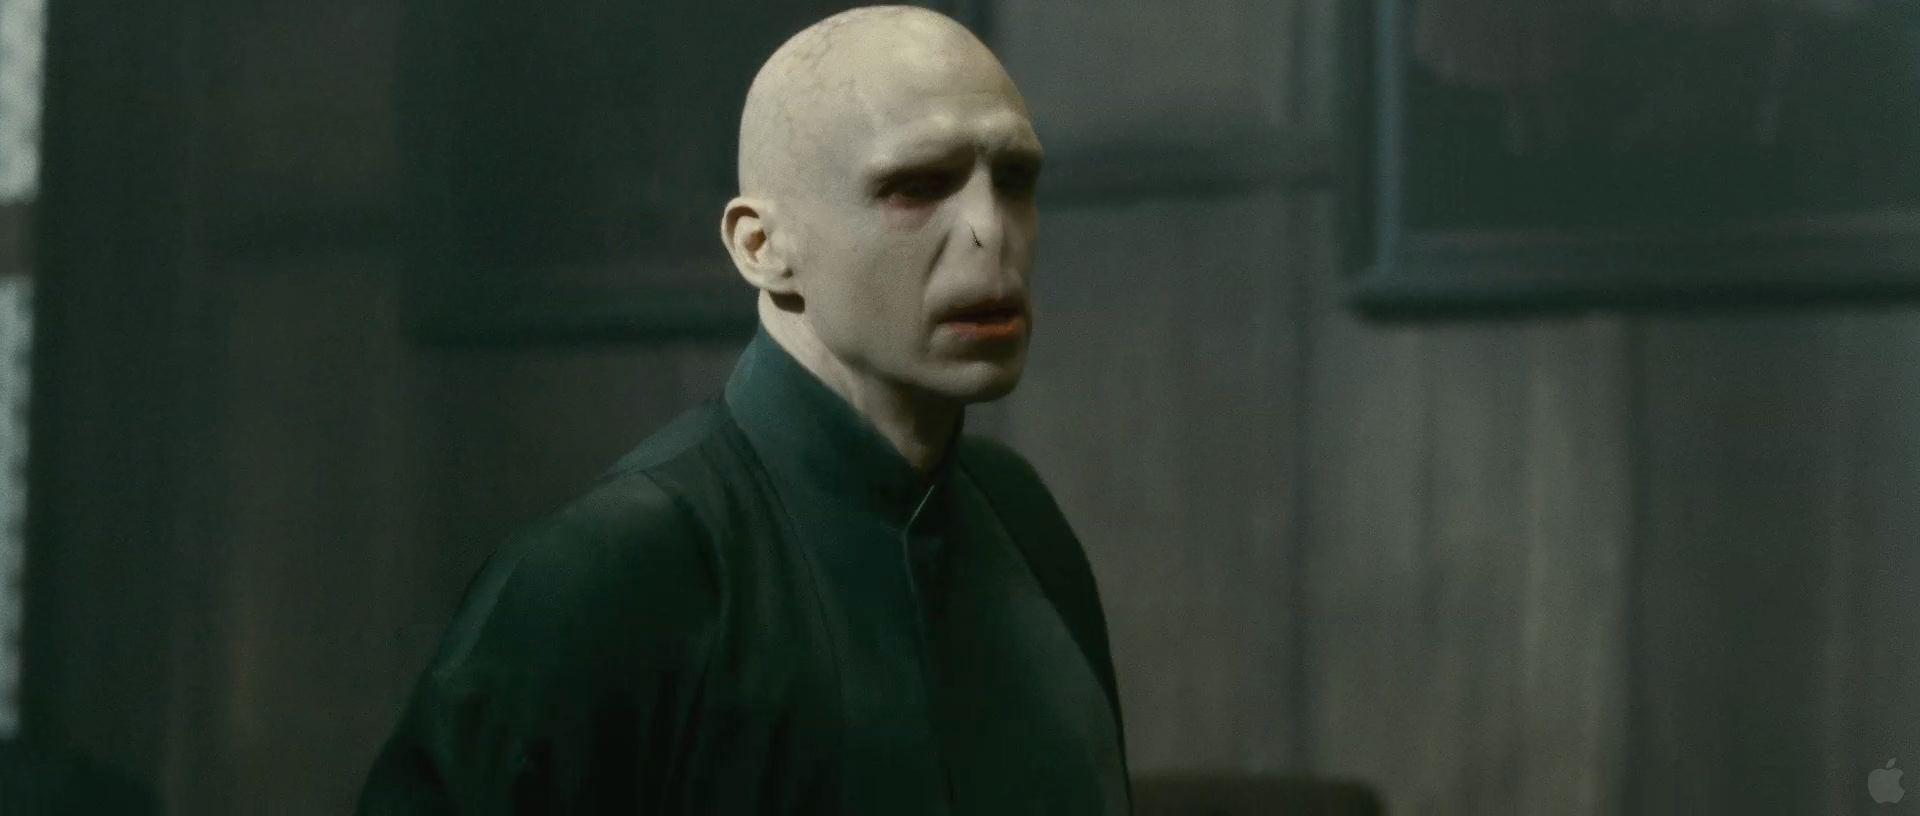 Harry Potter BlogHogwarts HP7 2 Trailer 18